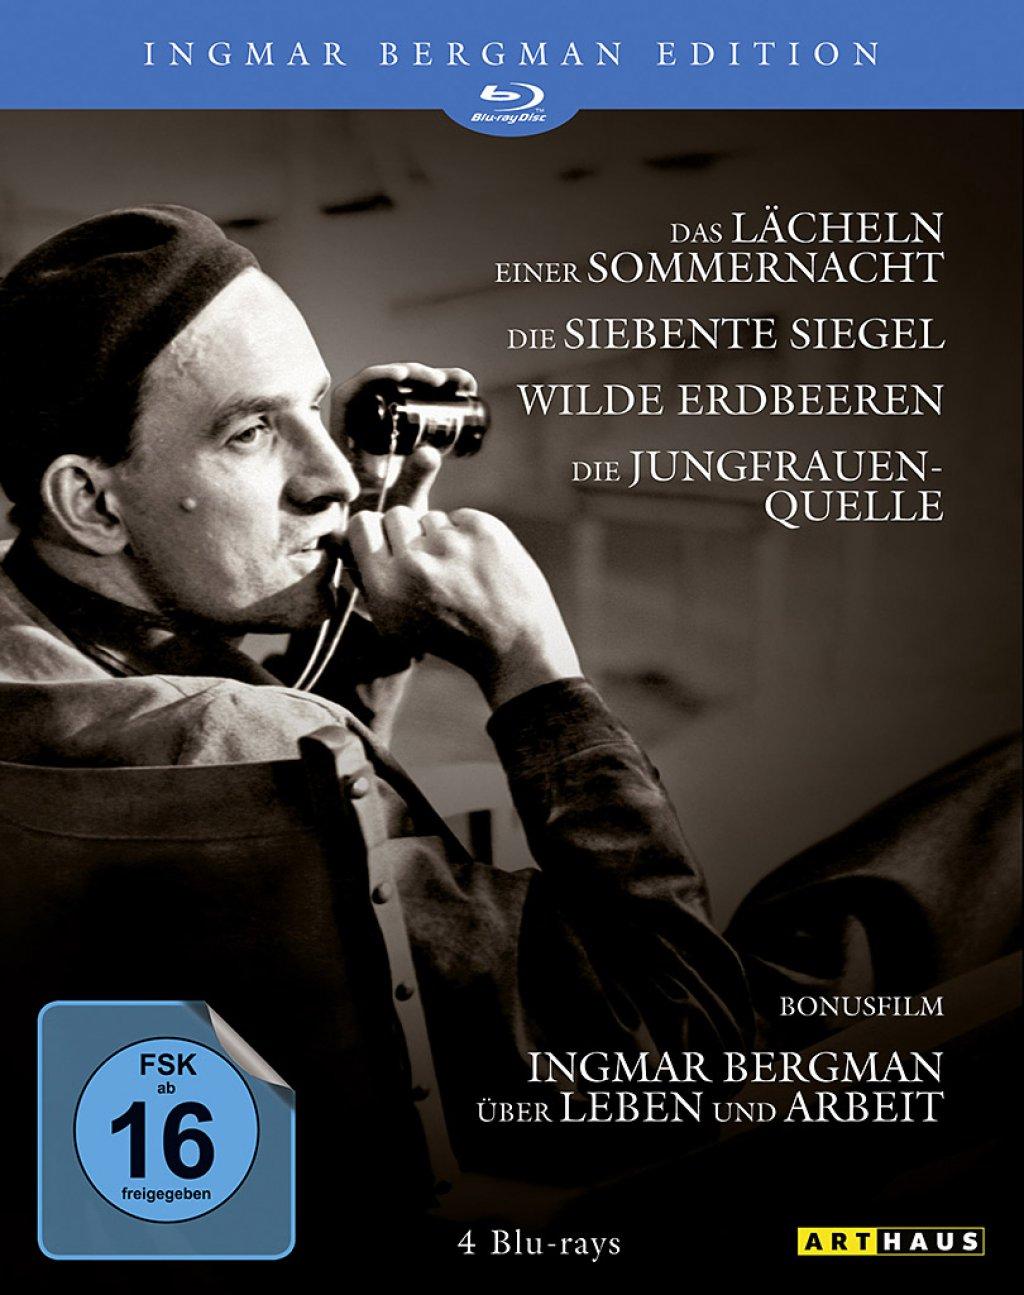 Ingmar Bergman Edition (Blu-ray)